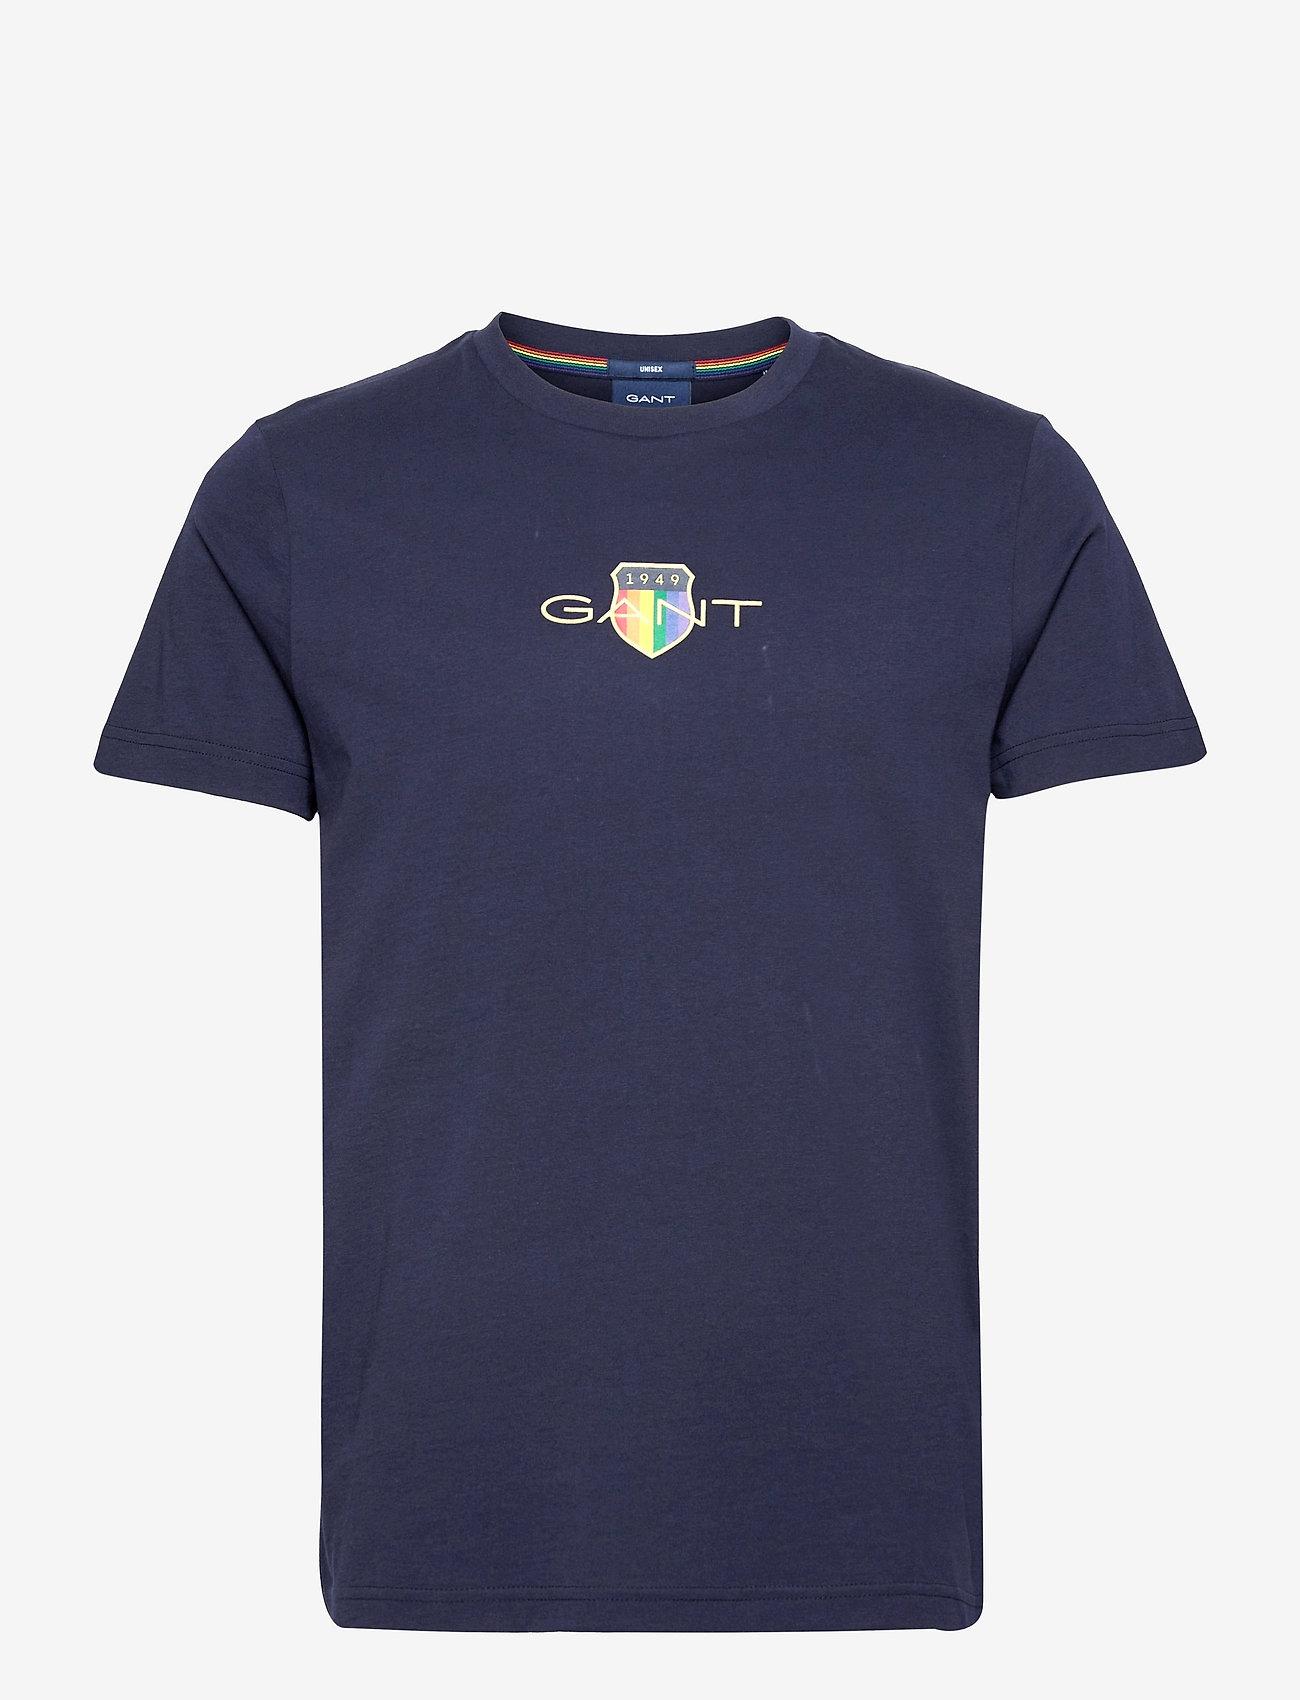 GANT - PRIDE. SS T-SHIRT - short-sleeved t-shirts - classic blue - 0